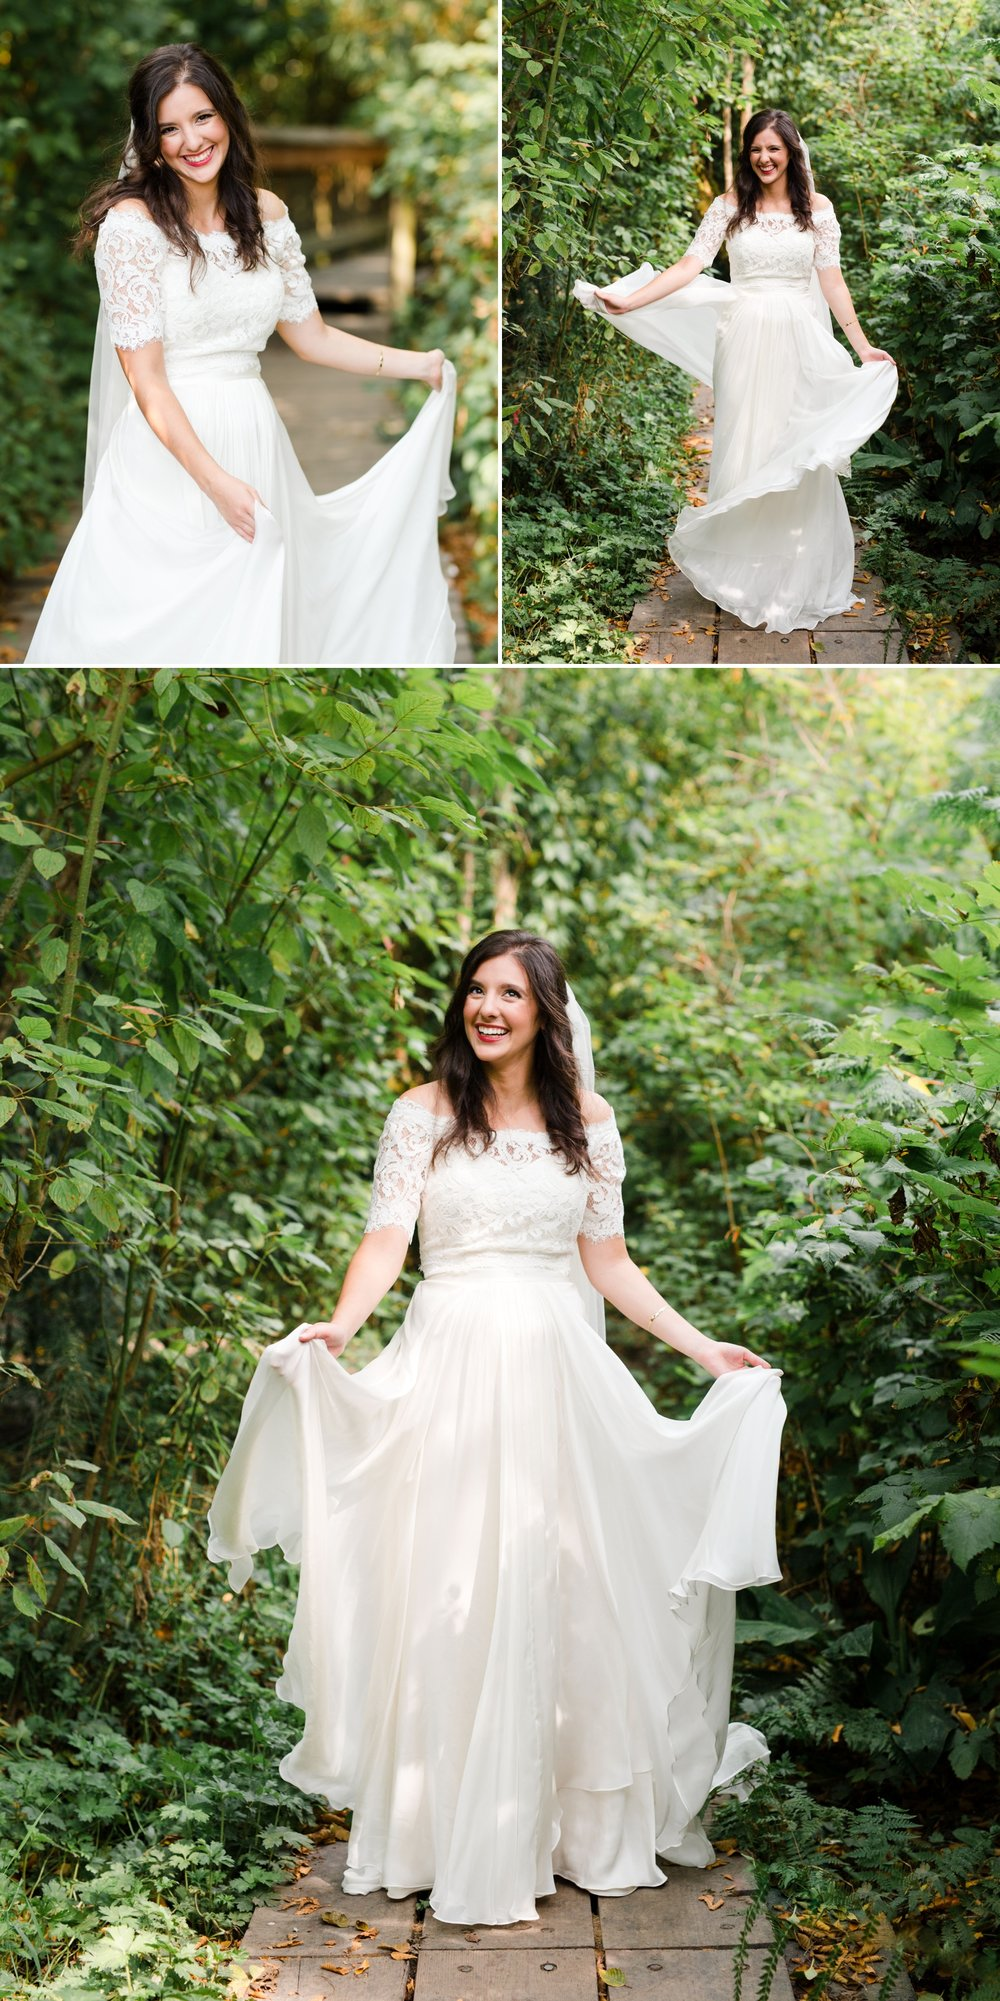 1-flowy-dress-bride.jpg